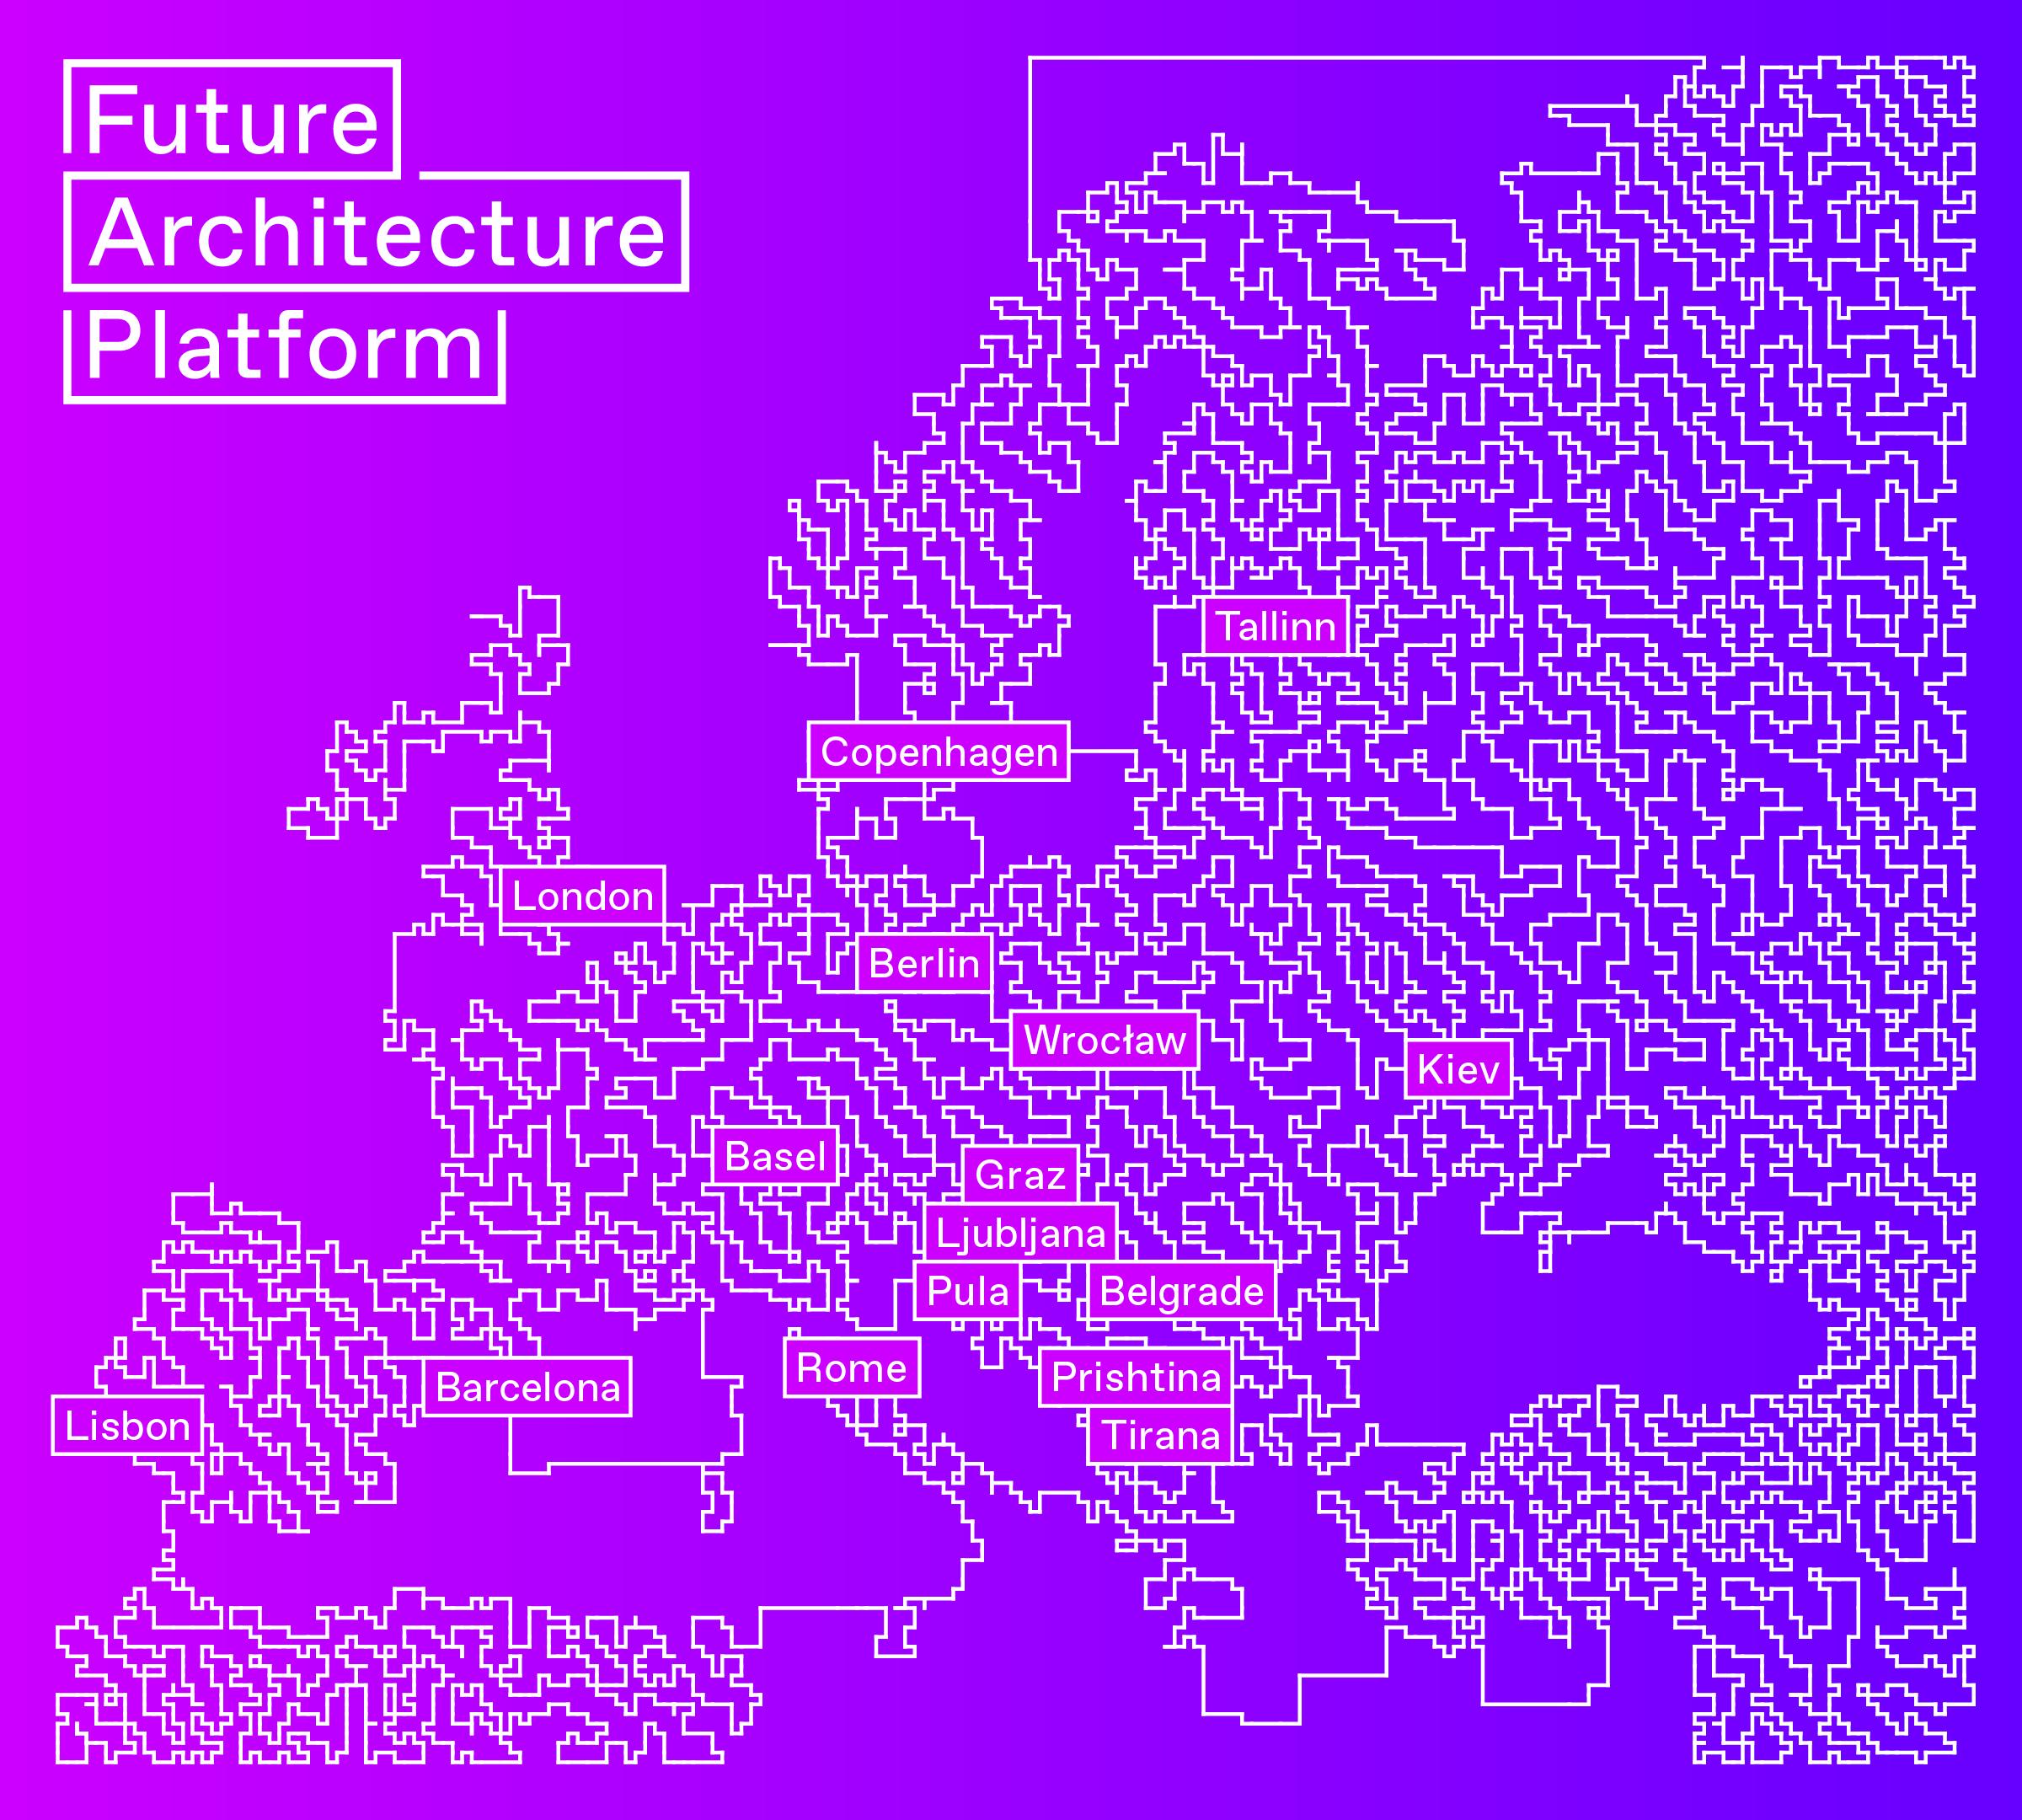 Selected Participants of 2018 :: Future Architecture Platform